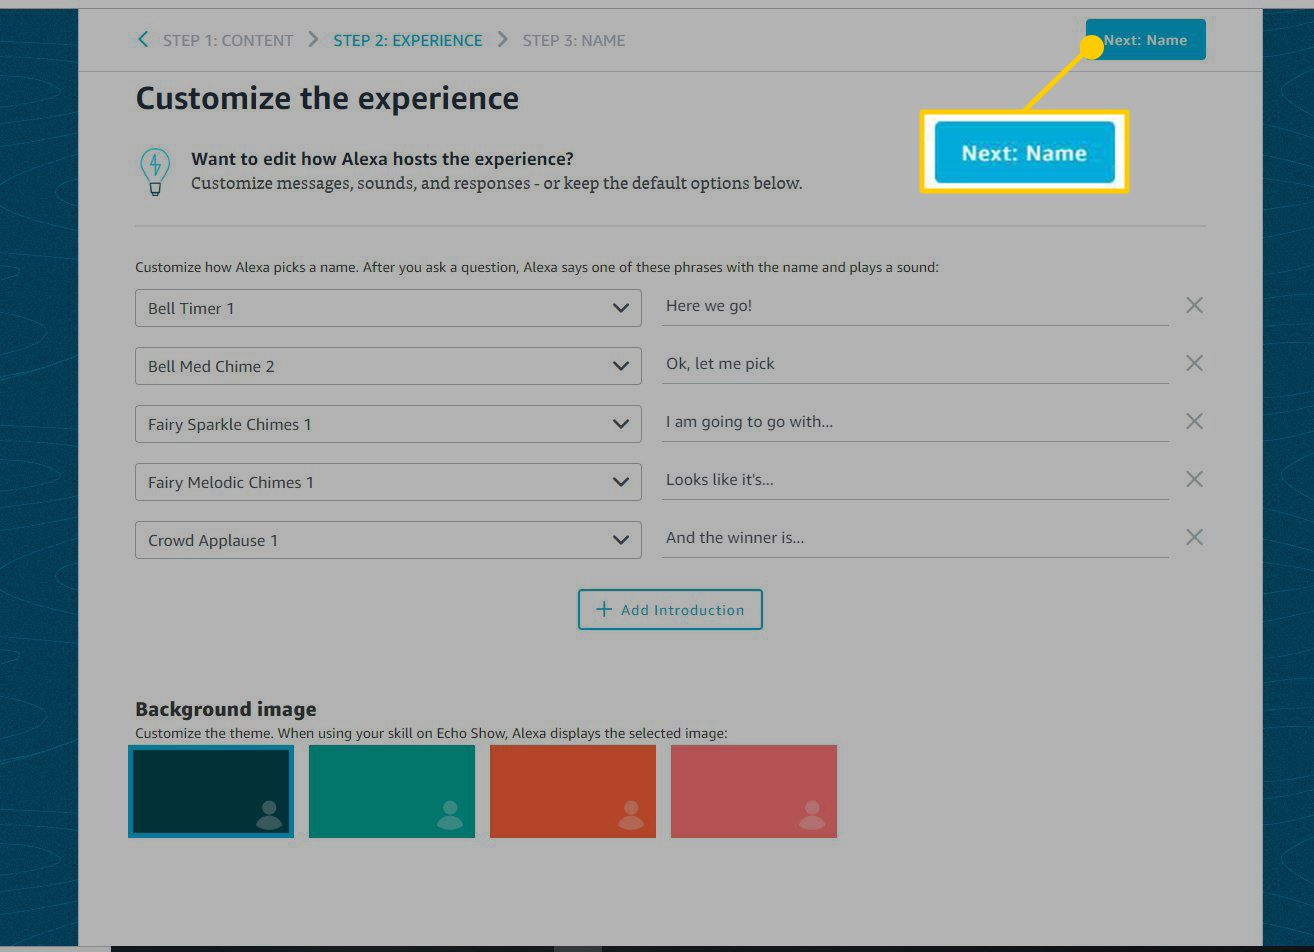 Screenshot of Customize Experience page of Alexa blueprint